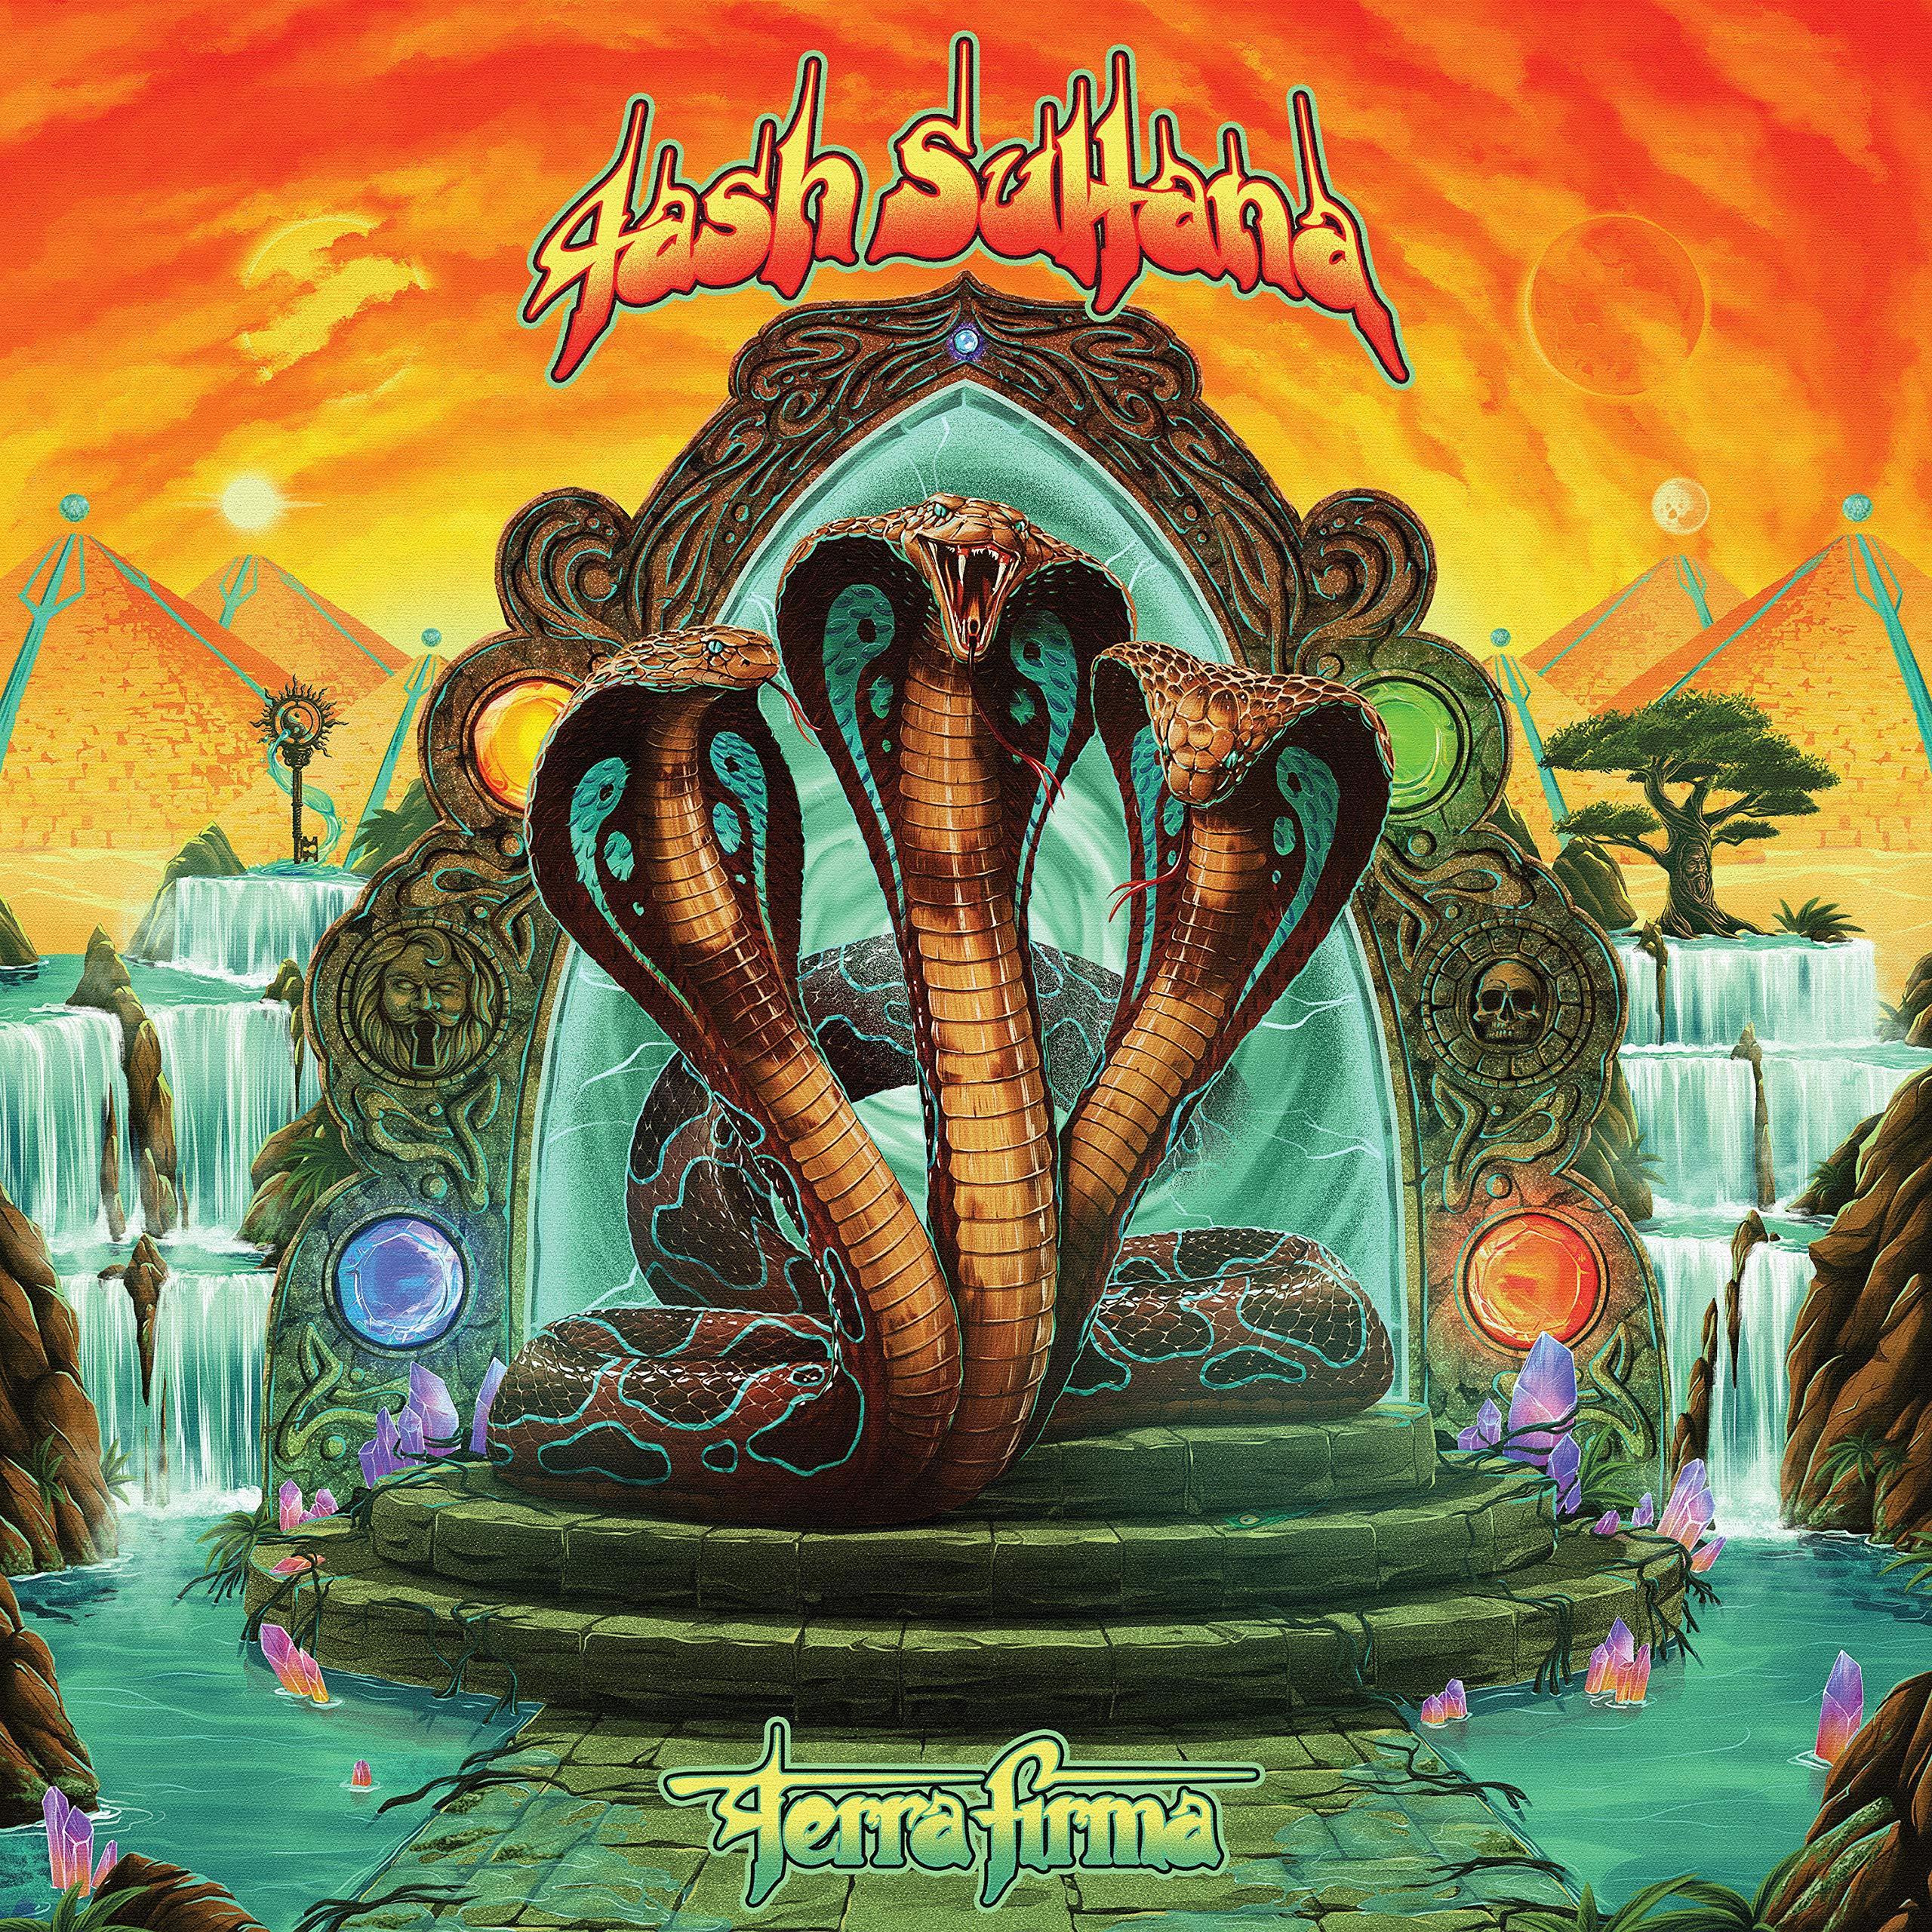 Tash Sultana - Terra Firma (2021) [FLAC] Download